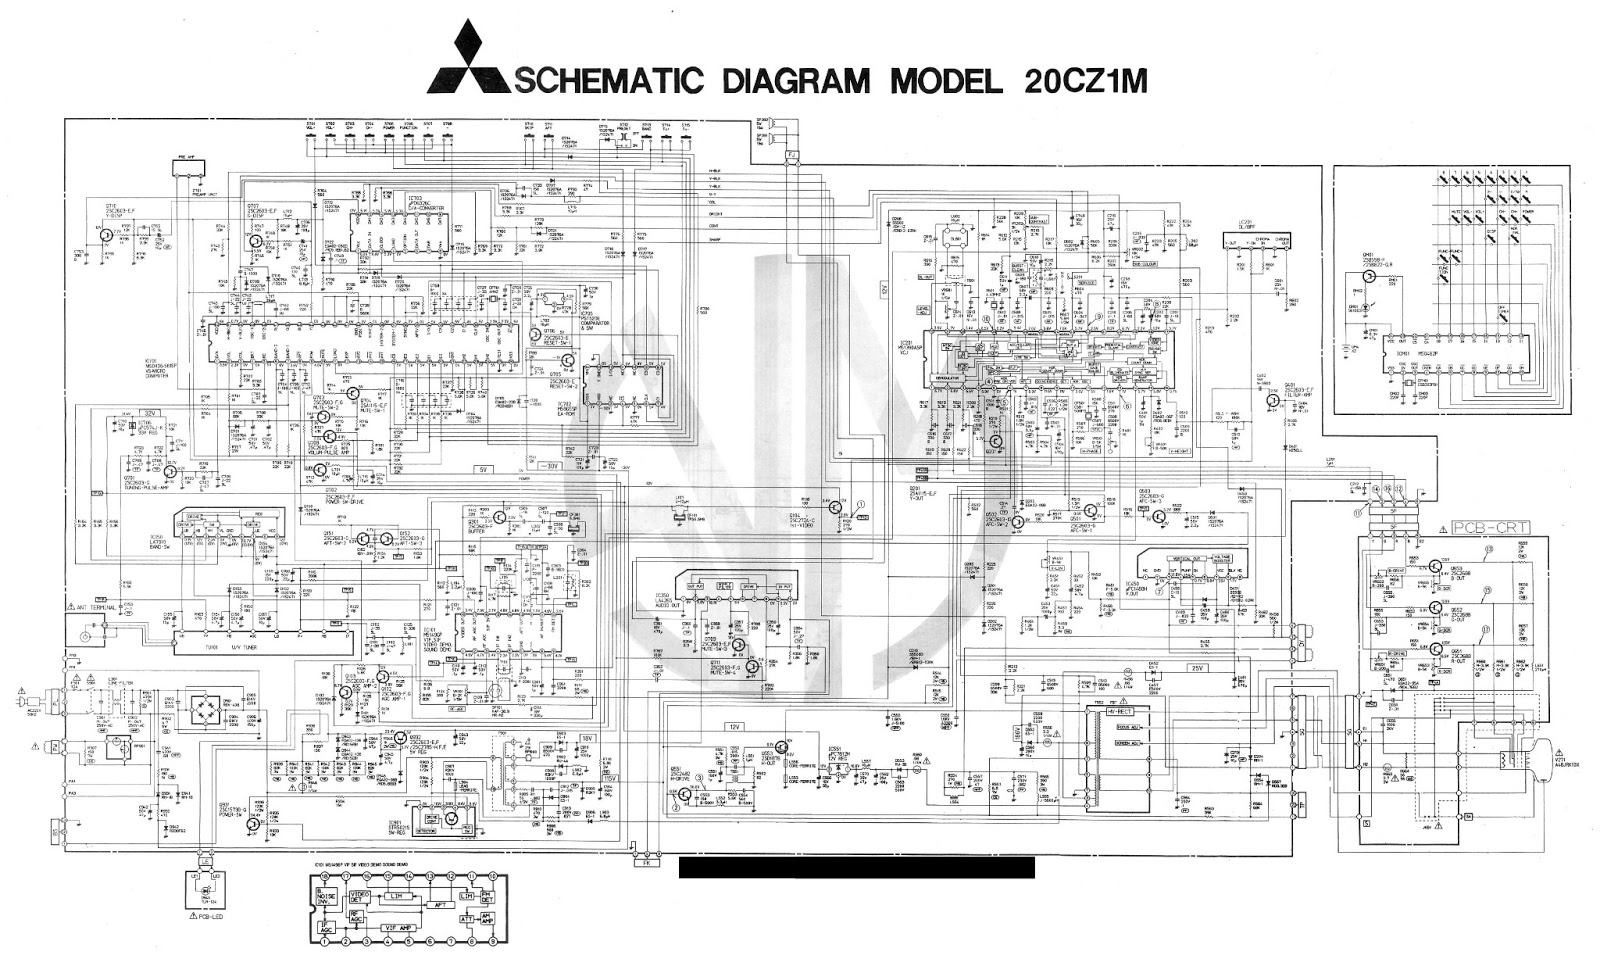 medium resolution of schematic diagram mitsubishi tv 15 13 combatarms game de u2022mitsubishi tv diagram 10 artatec automobile